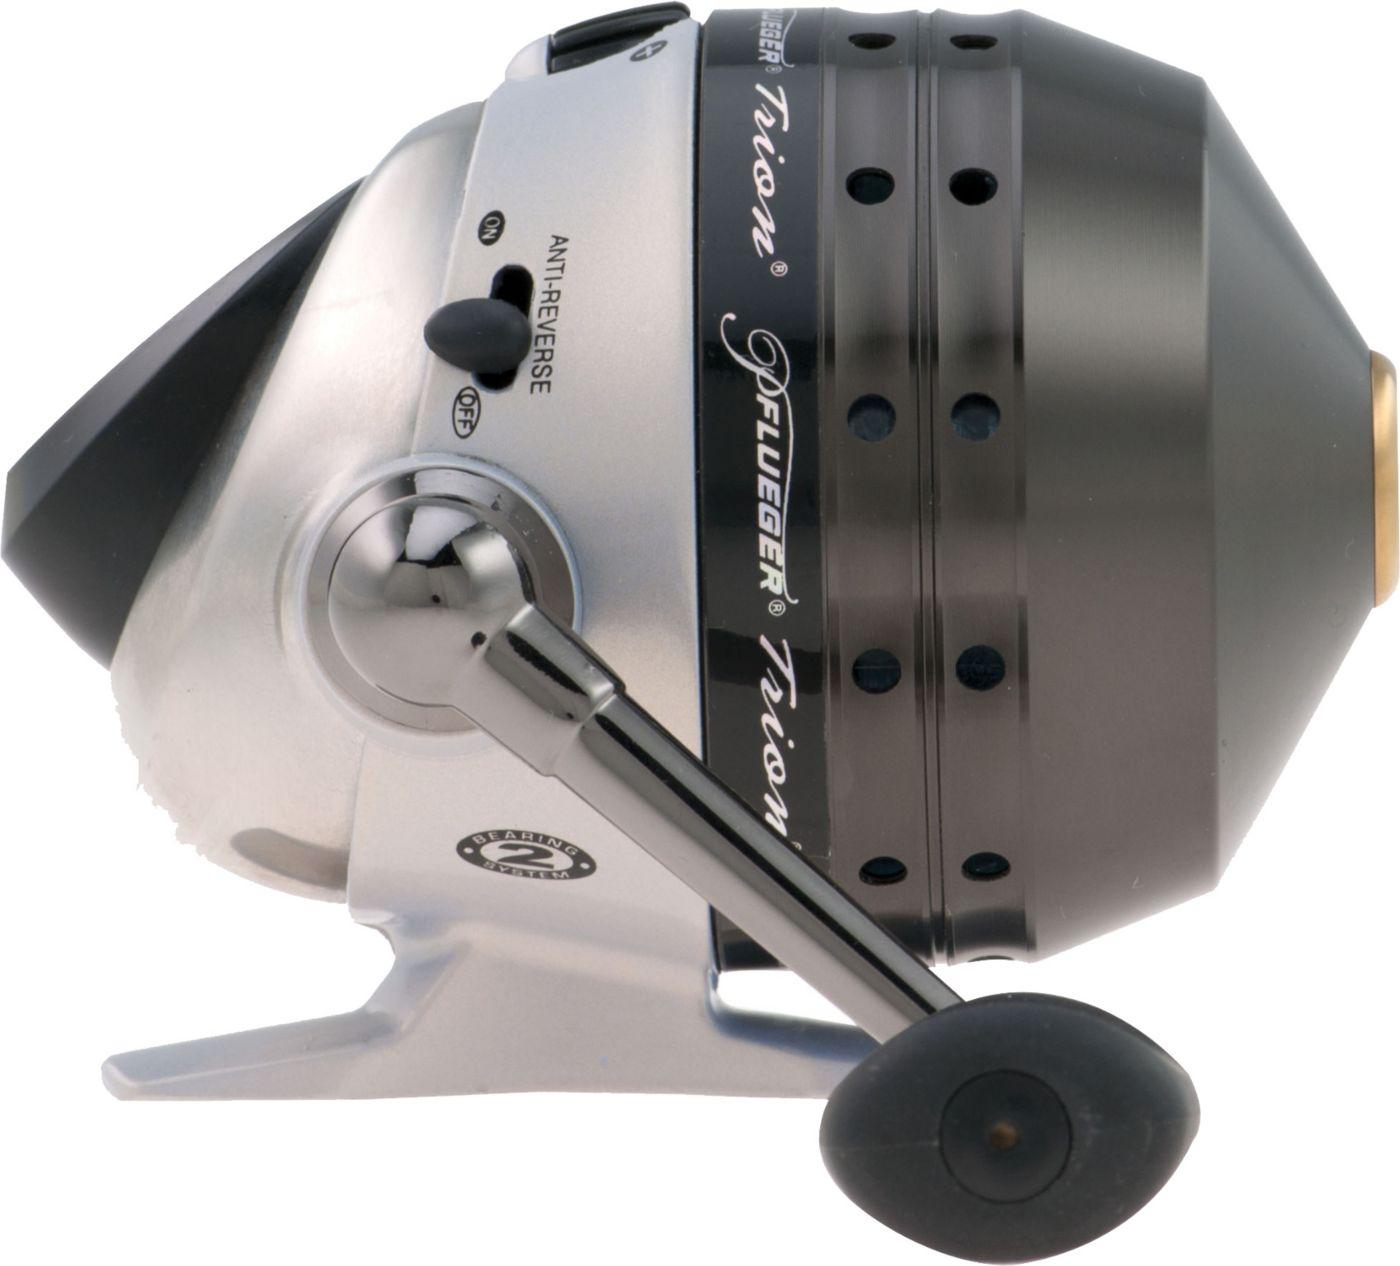 Pflueger Trion MicroCast Spincast Reel